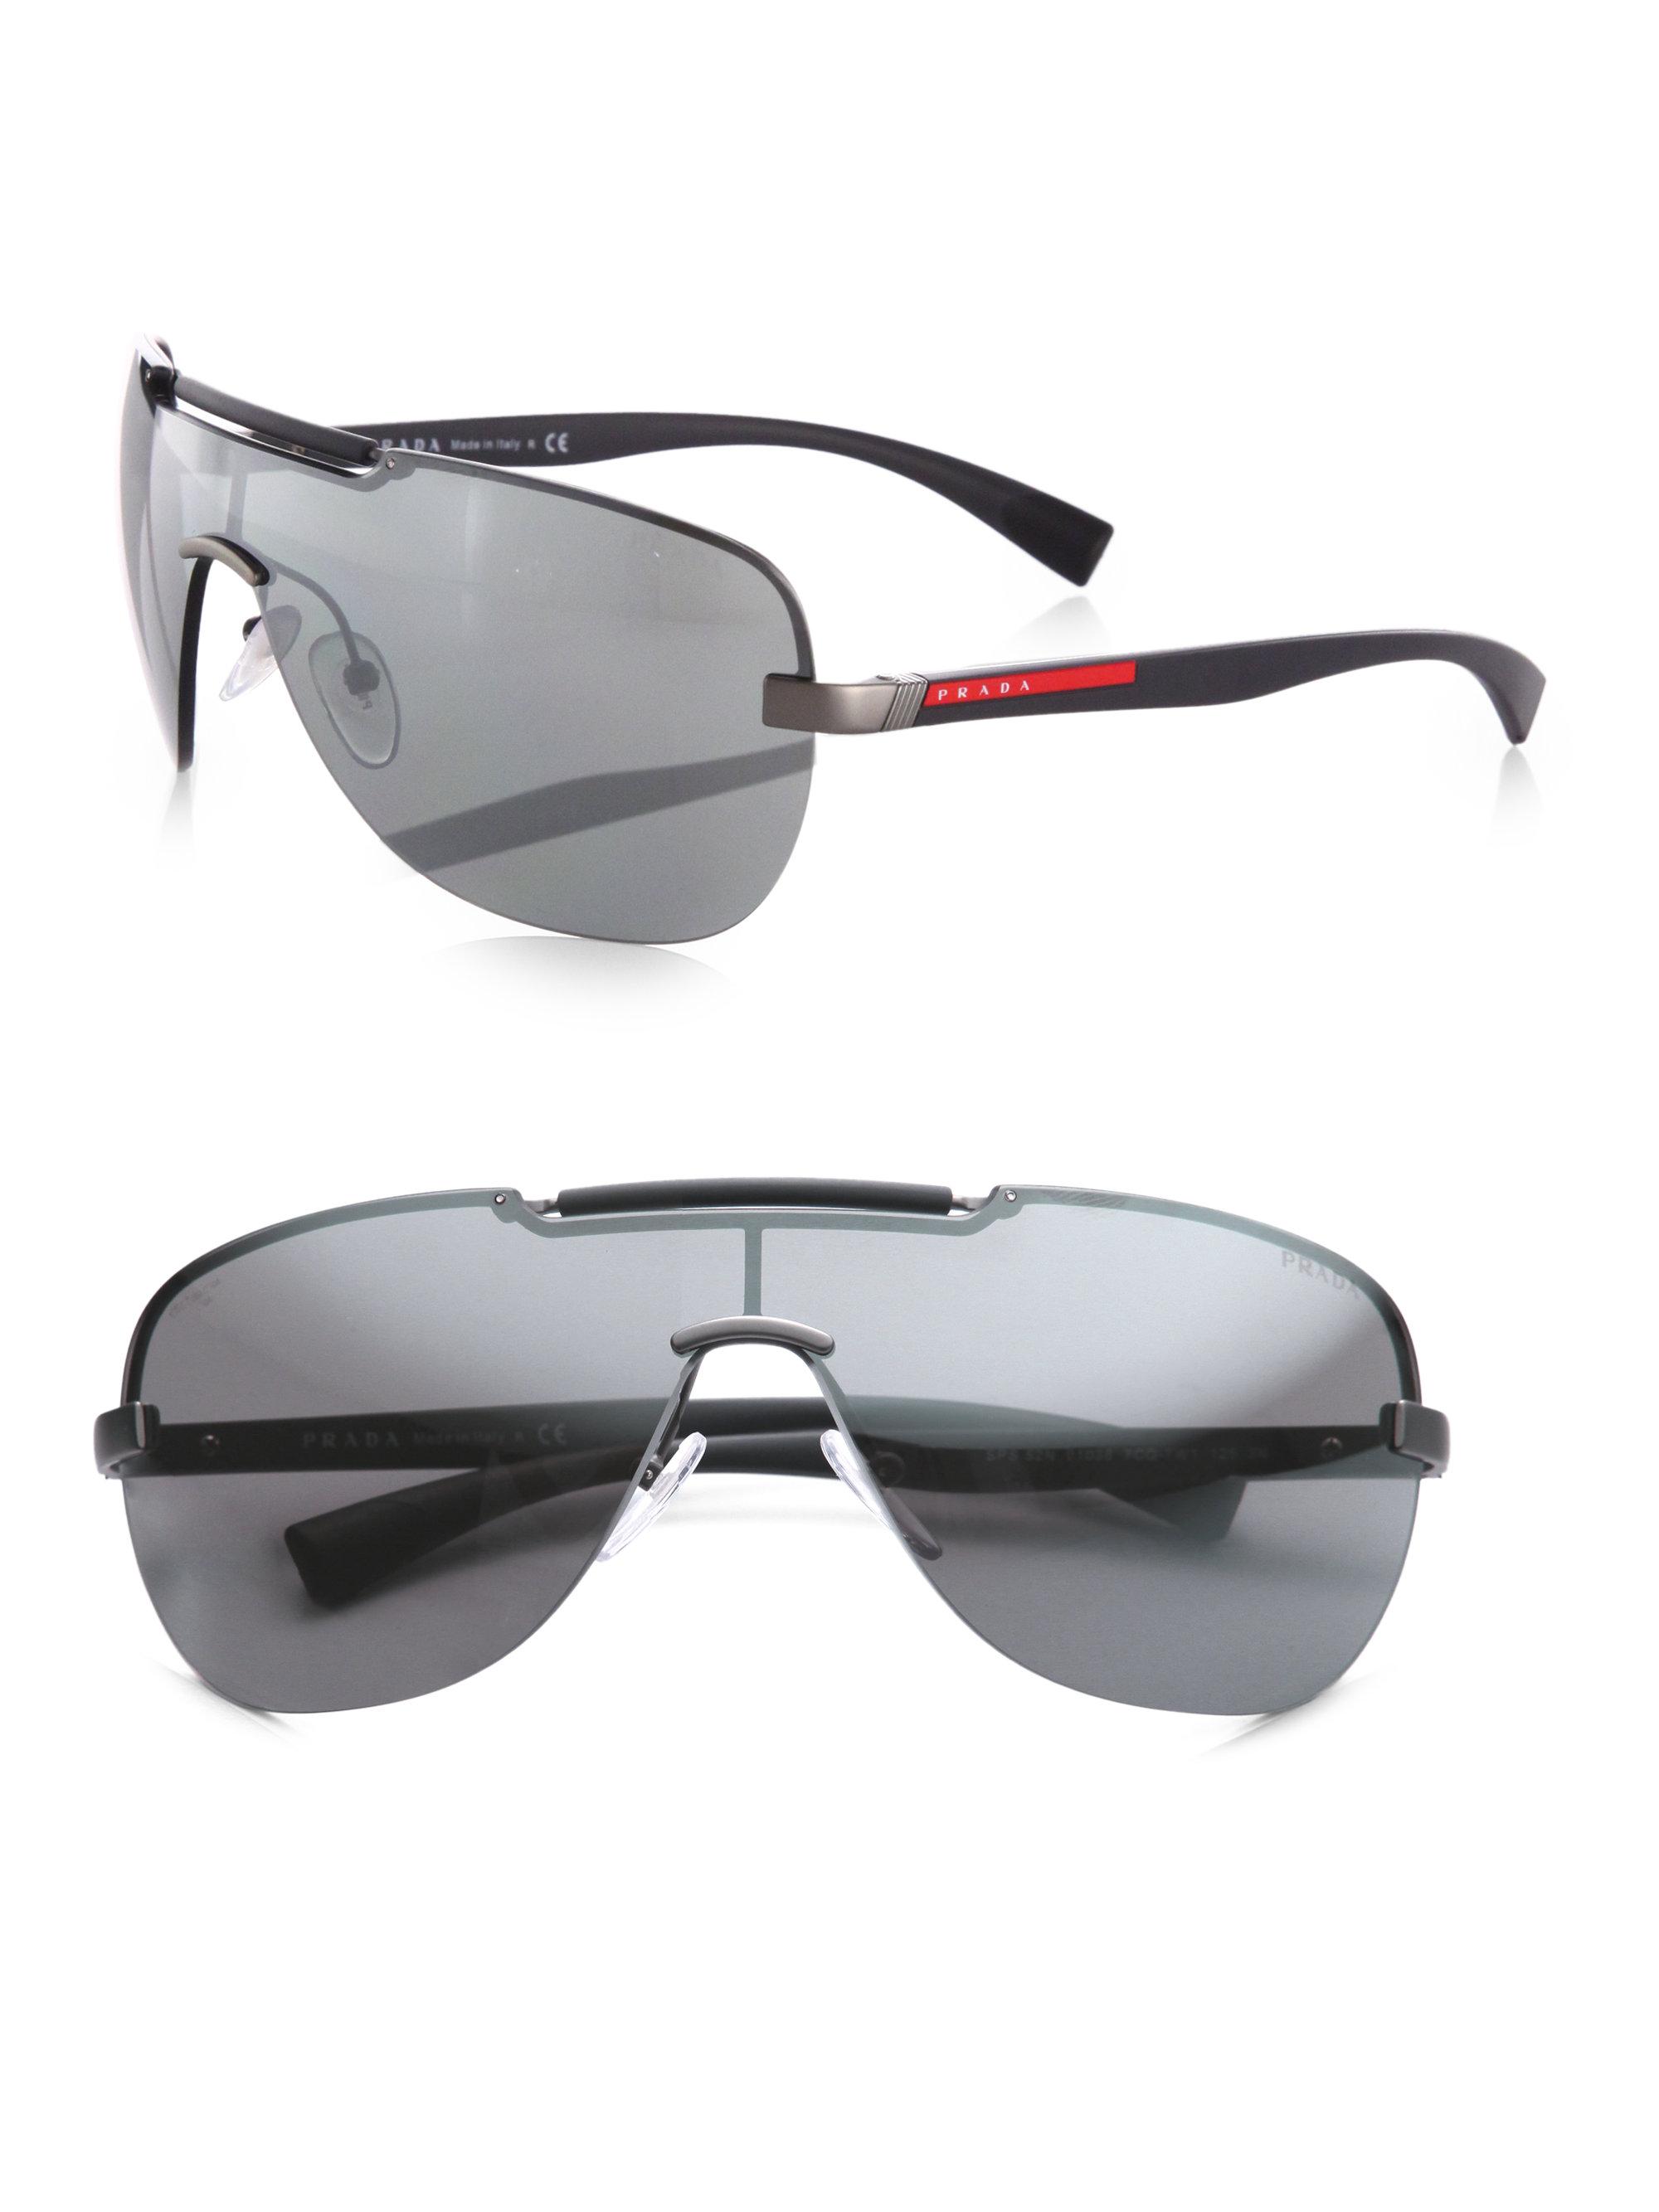 47811d22ad6 ... cheapest lyst prada metal shield sunglasses in metallic a544d fb76e